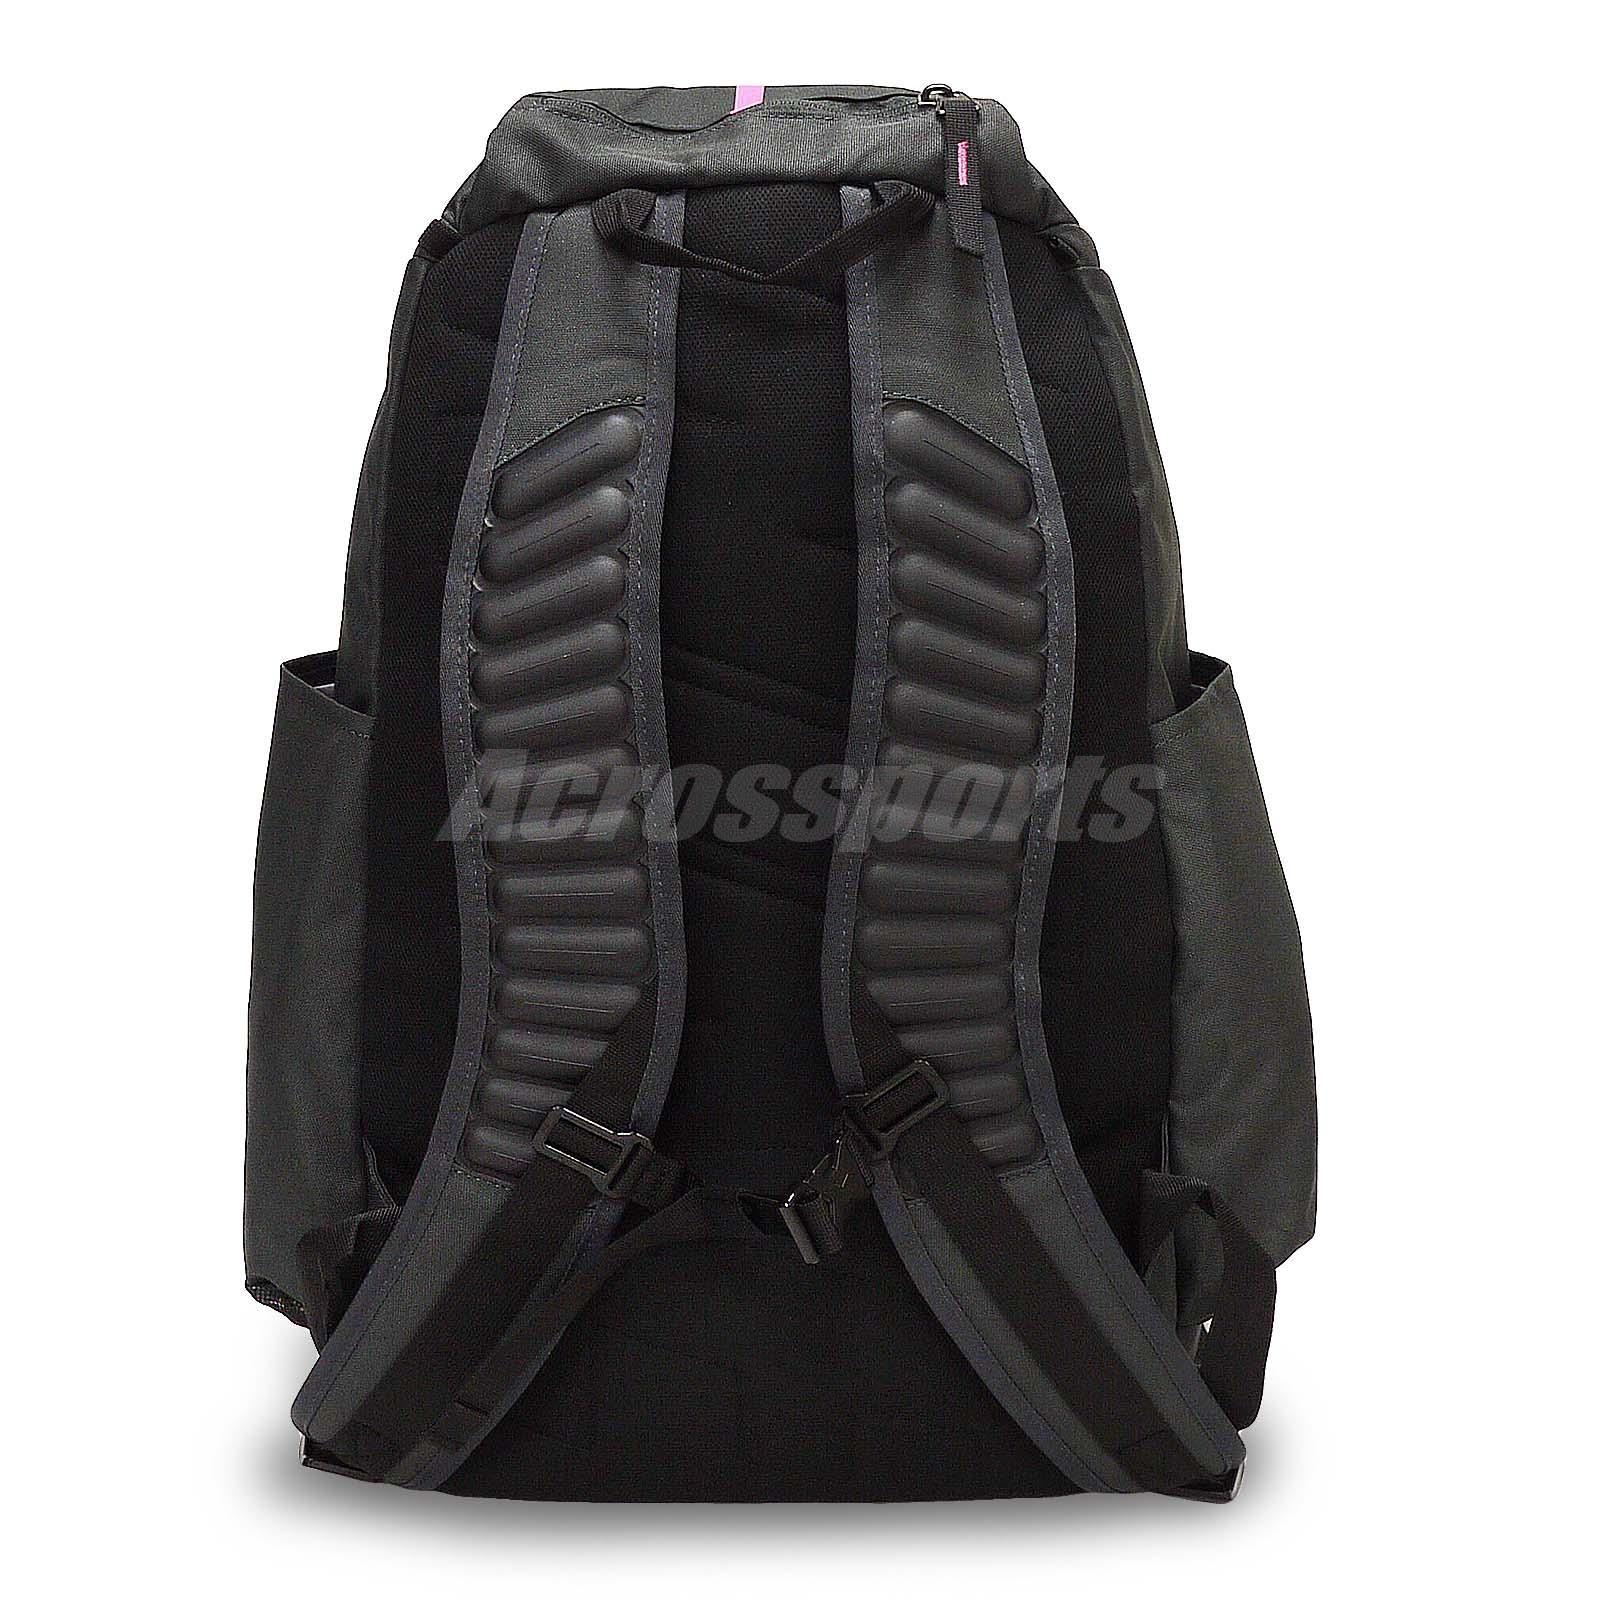 Nike Hoops Elite Max Air Backpack Kay Yow Basketball Bag BP Training ... 3cfc307da6a6f